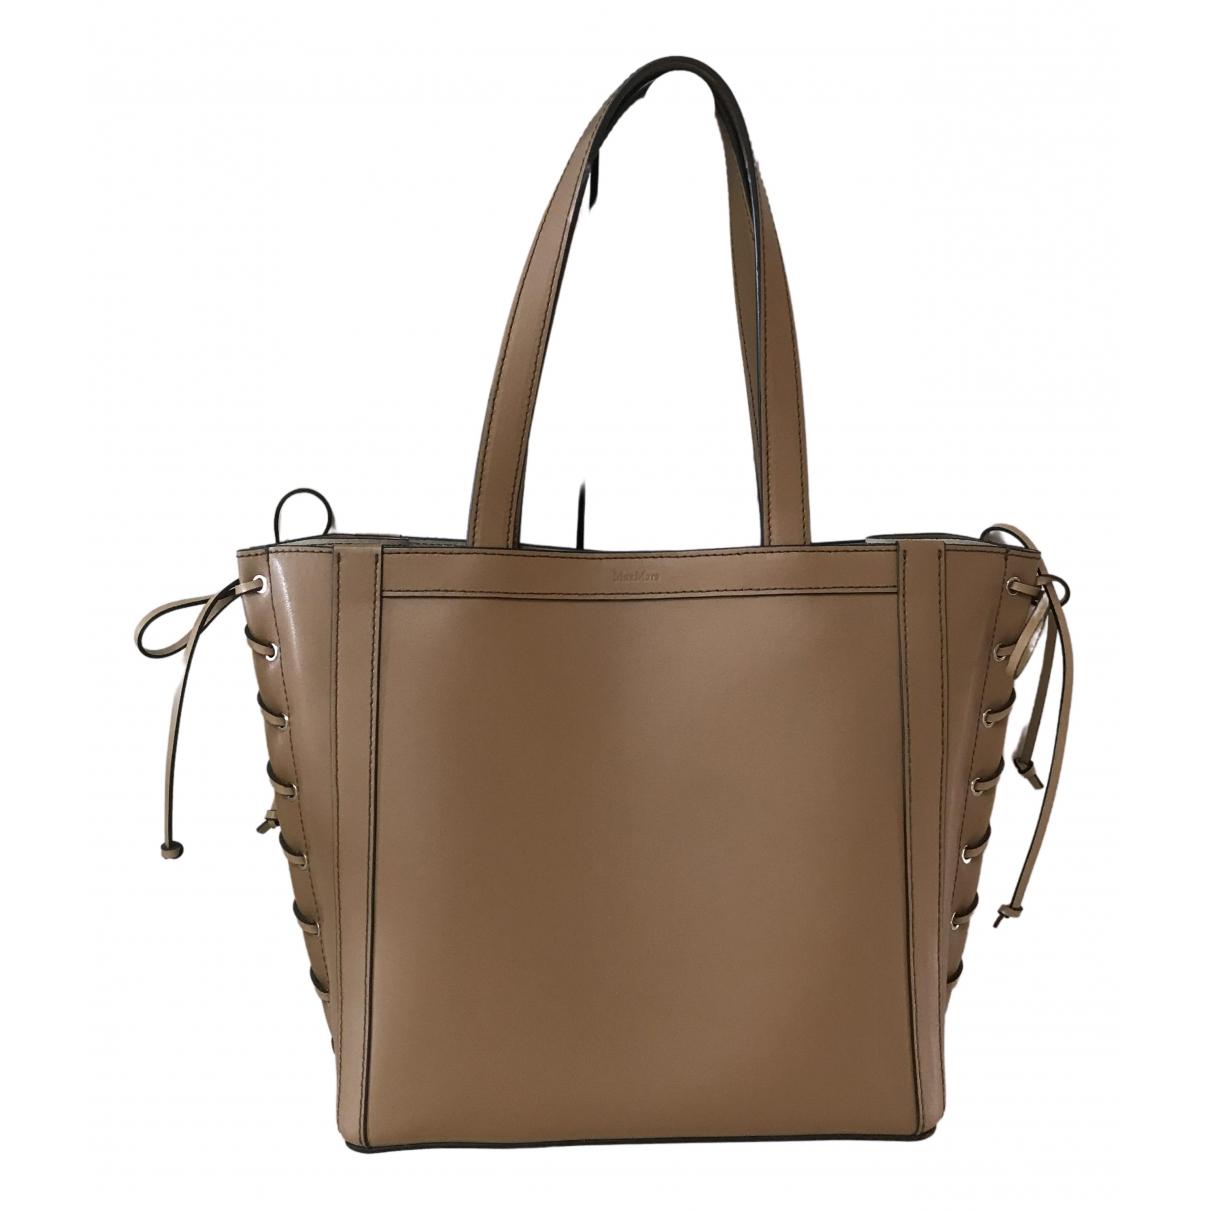 Max Mara N Camel Leather handbag for Women N